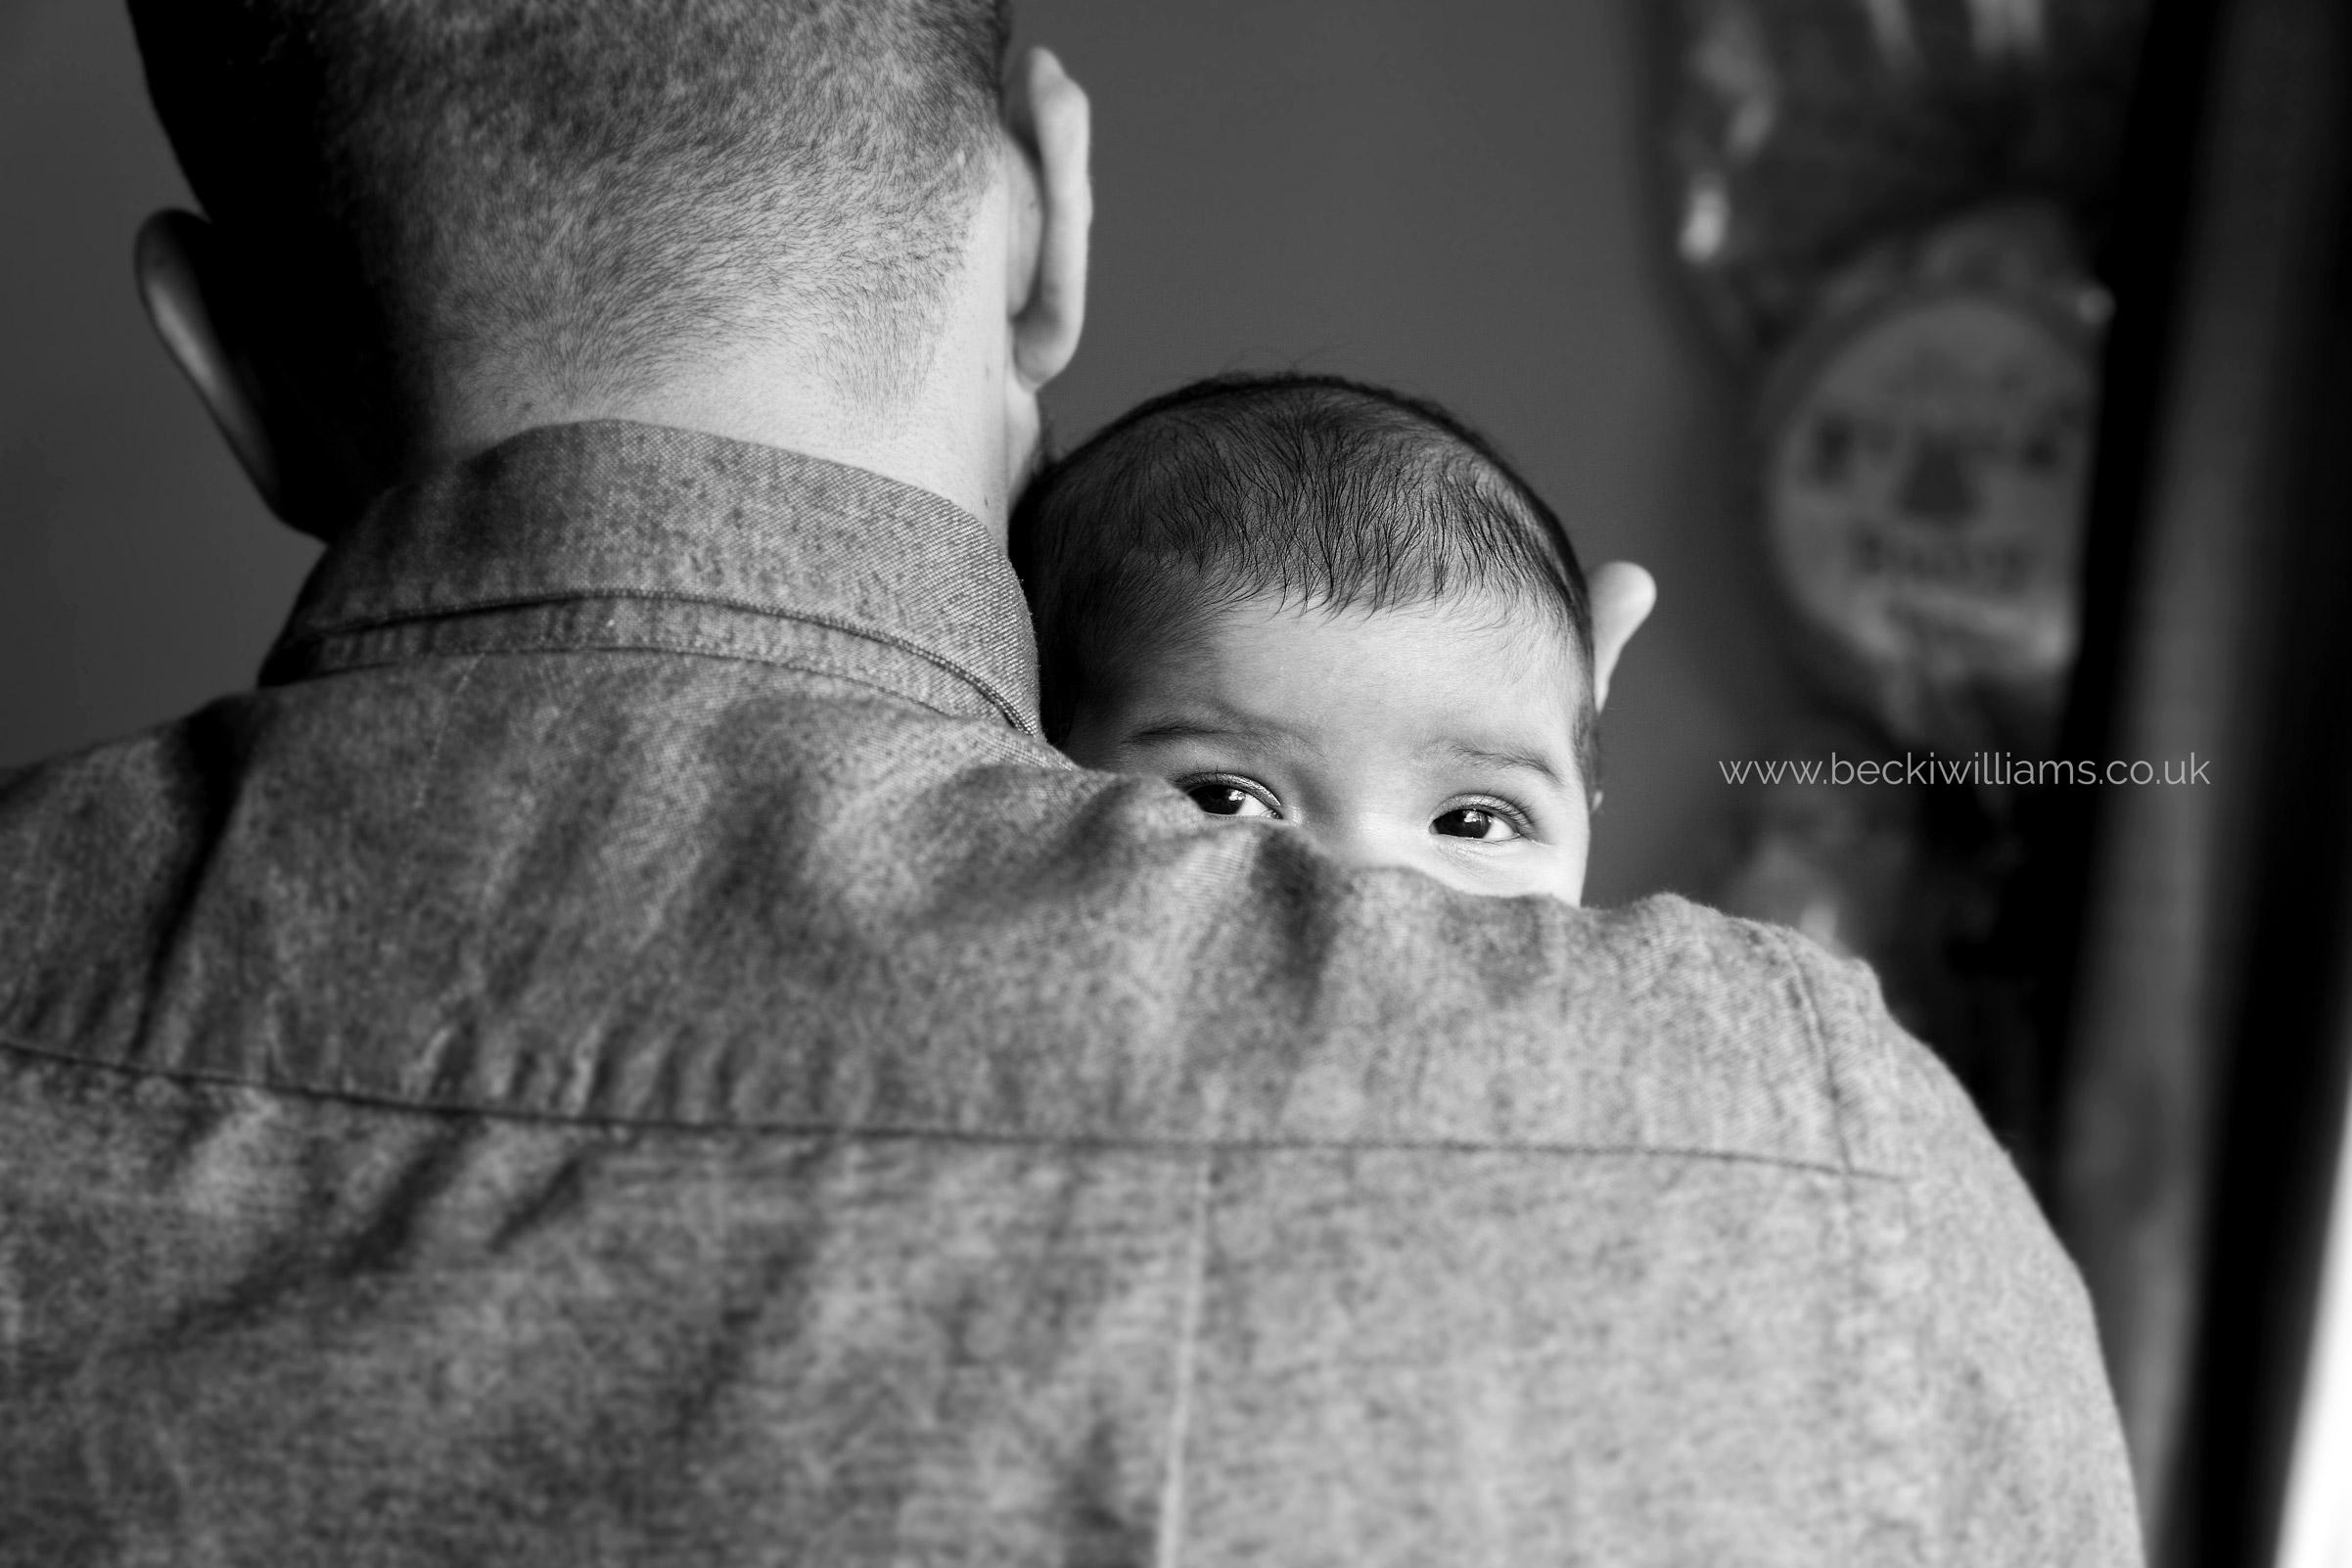 newborn baby girl peeks over her dadies shoulder in black and white